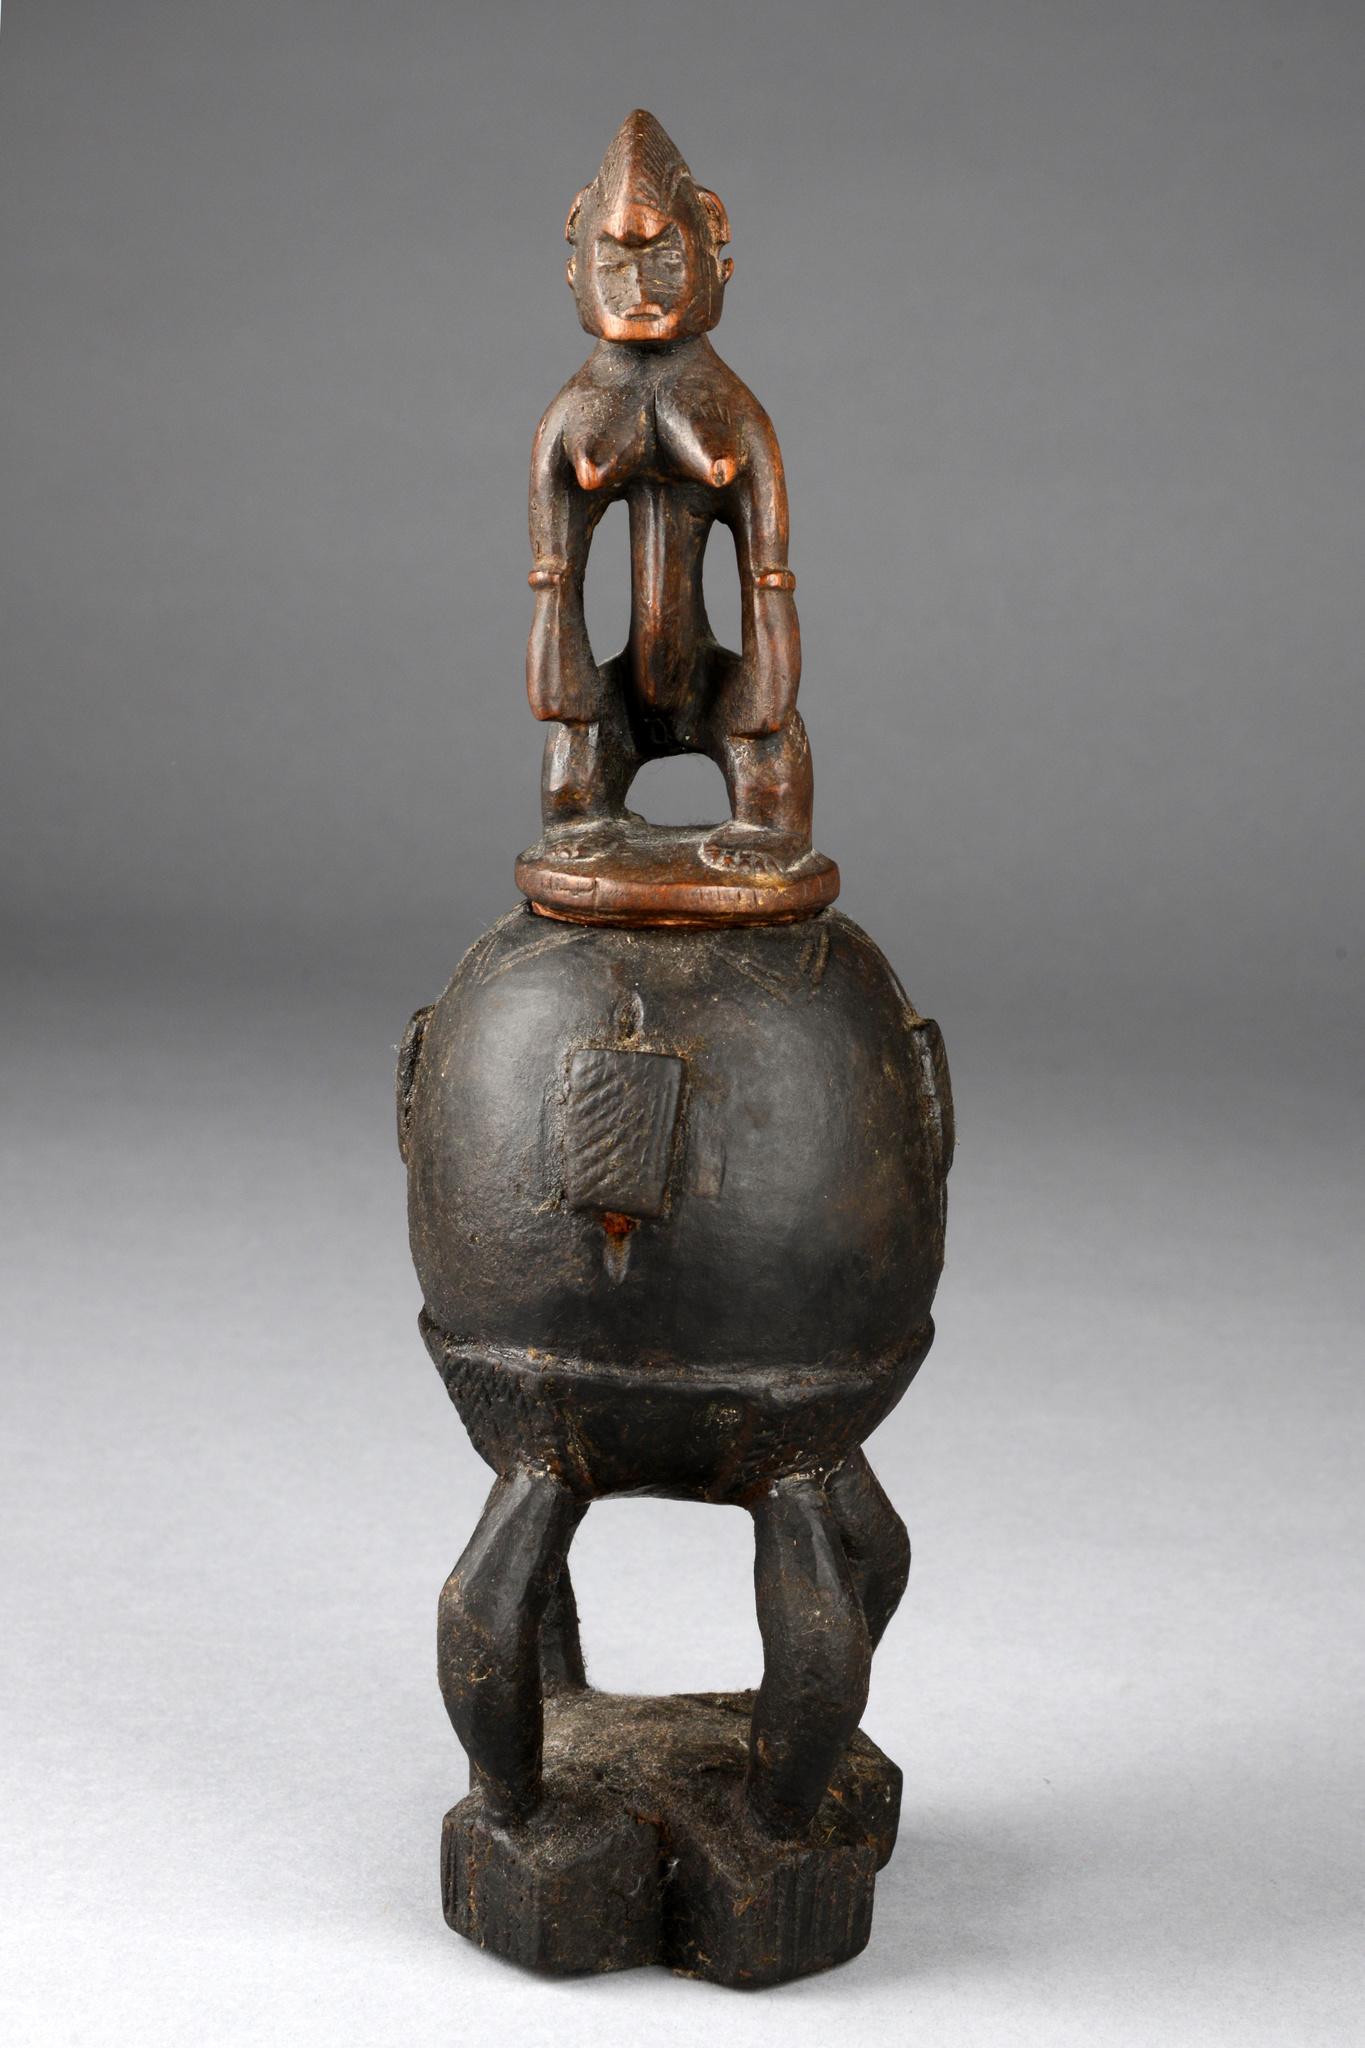 Figural beschnitzter Behälter